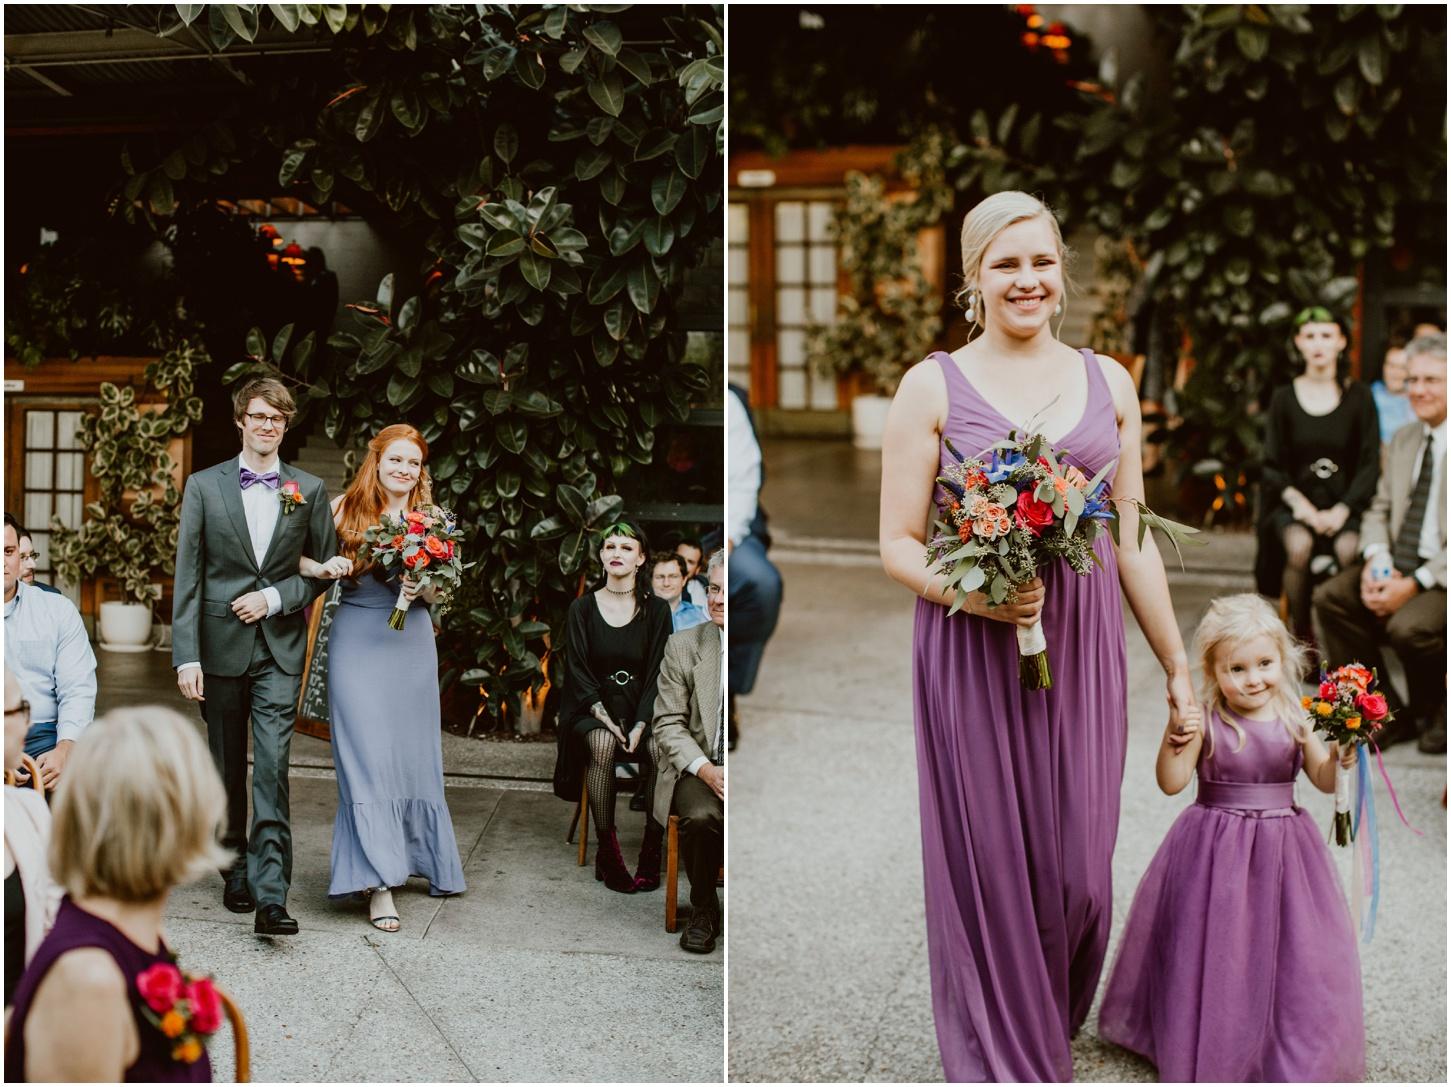 Smogshoppe-Wedding-S+C-Diana-Lake-Photography-369.jpg